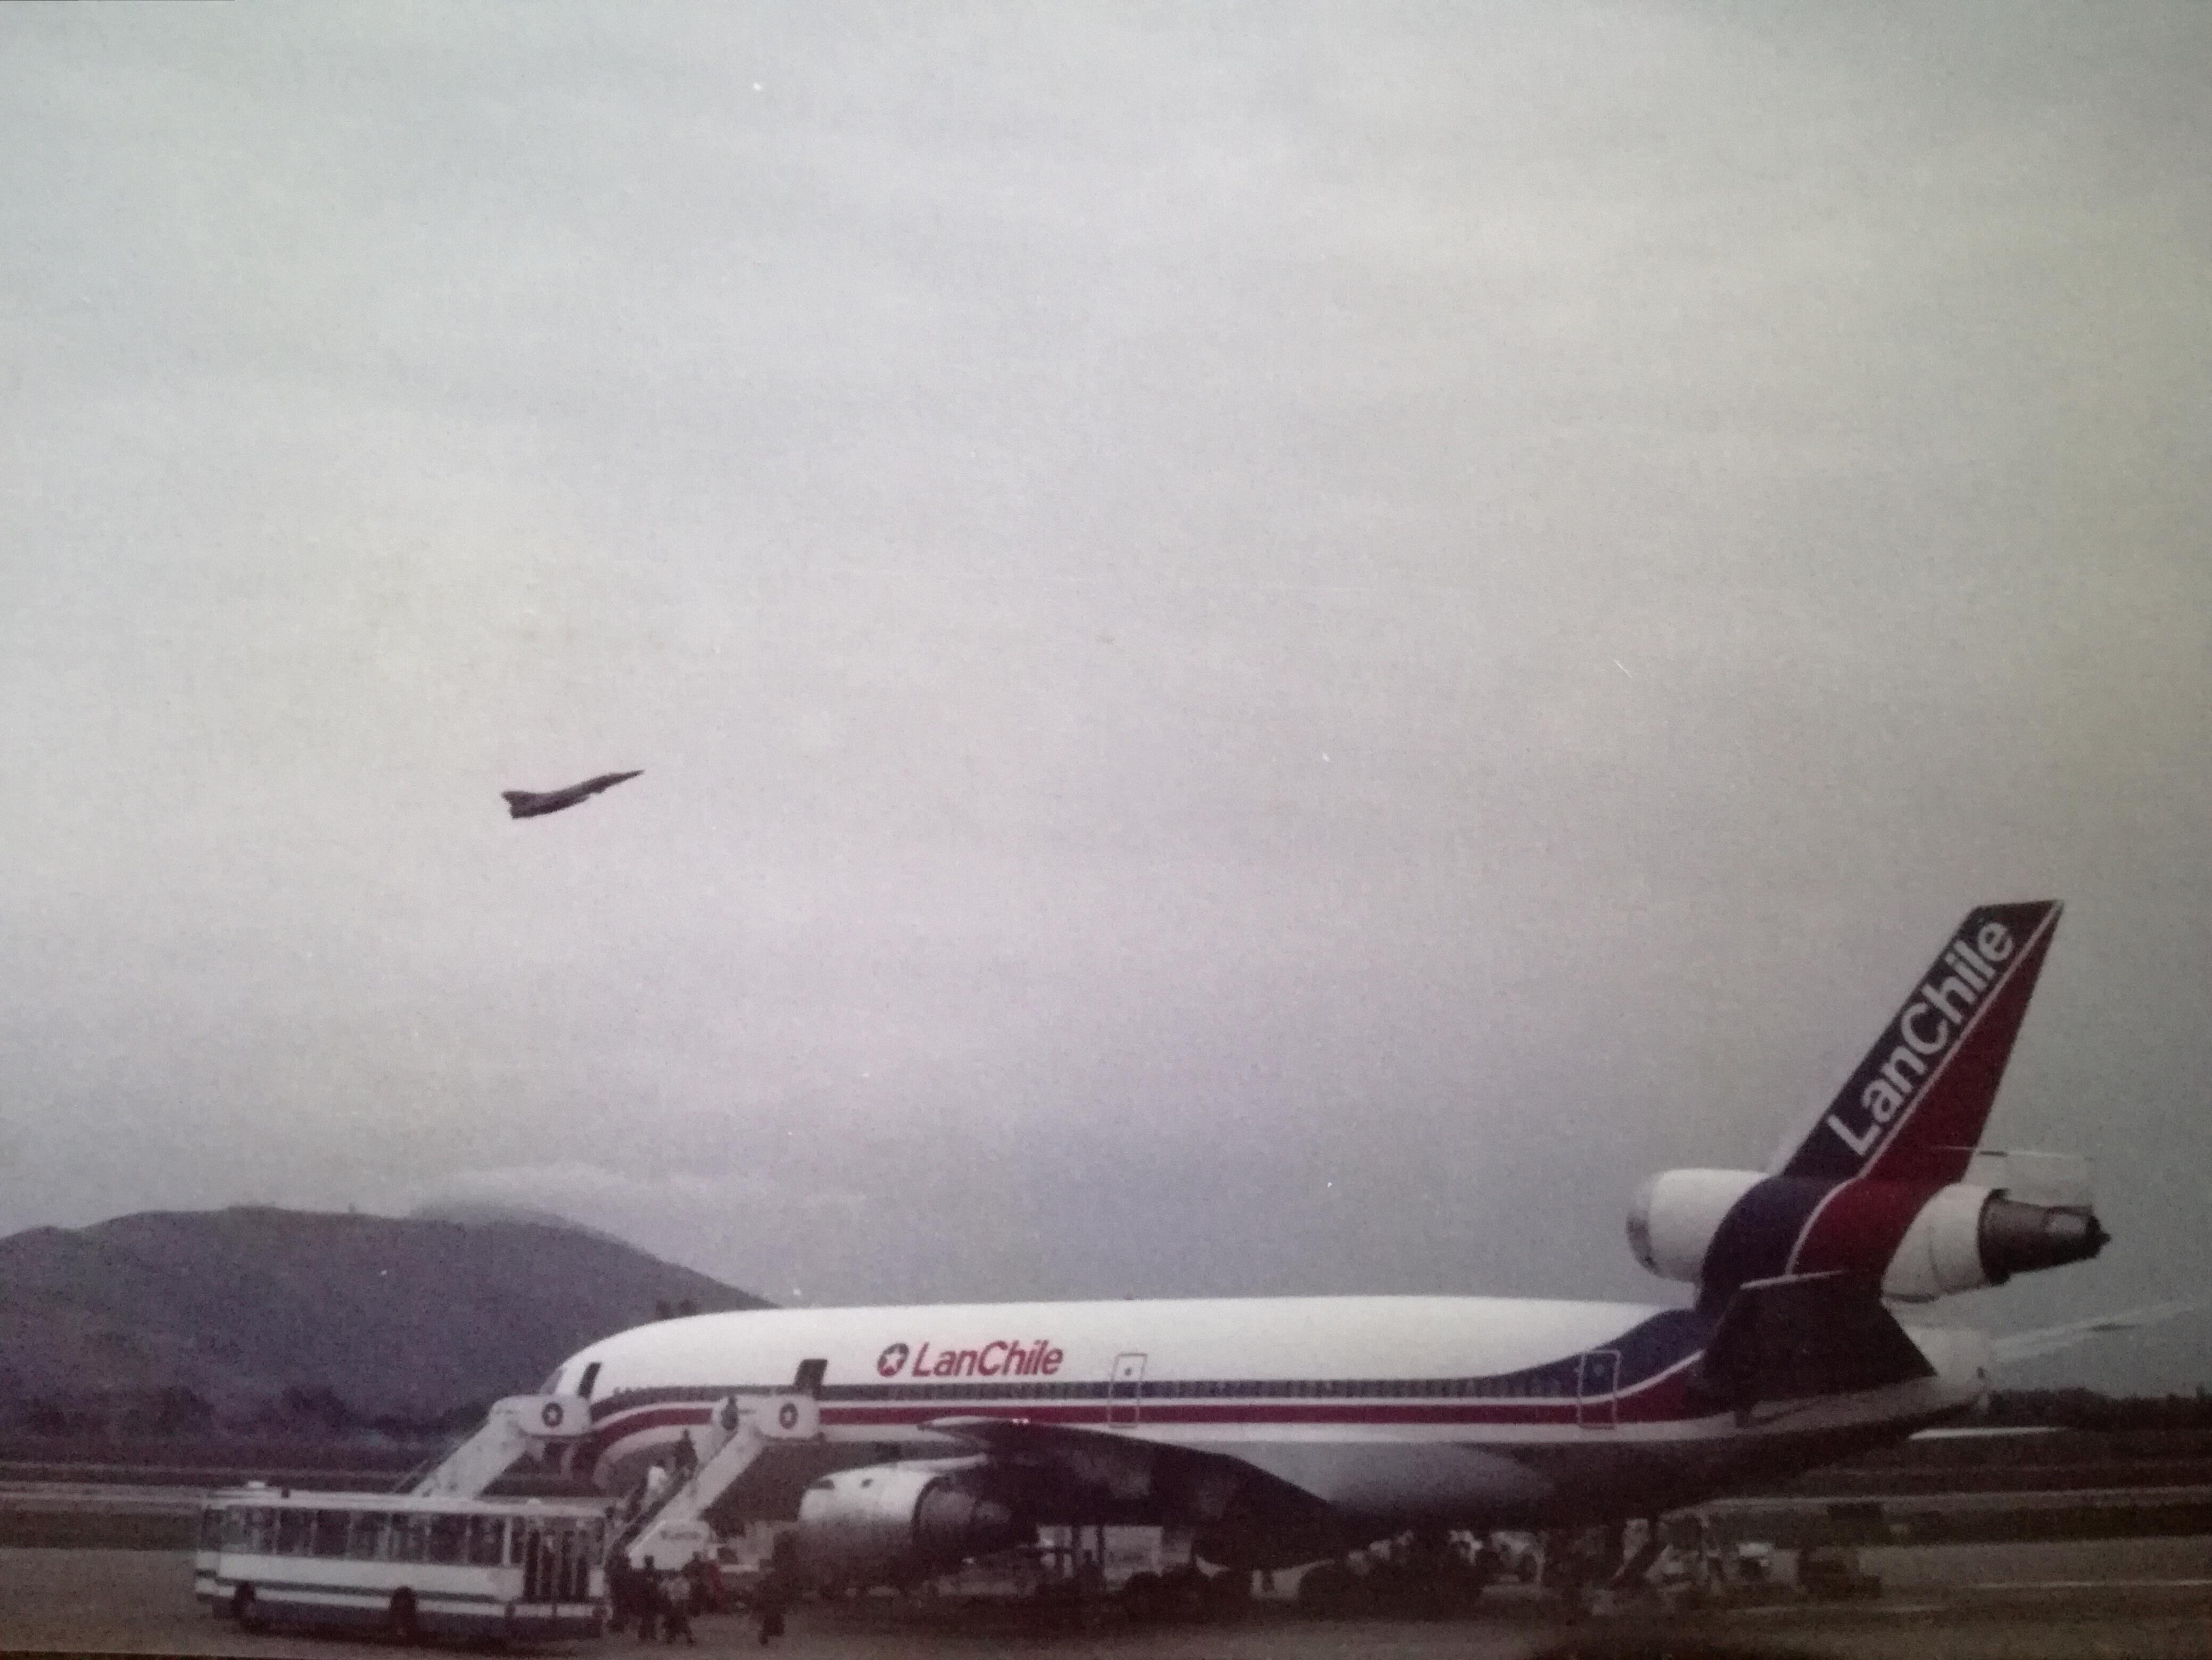 Enterreno - Fotos históricas de chile - fotos antiguas de Chile - Avión de Lan Chile, 1985